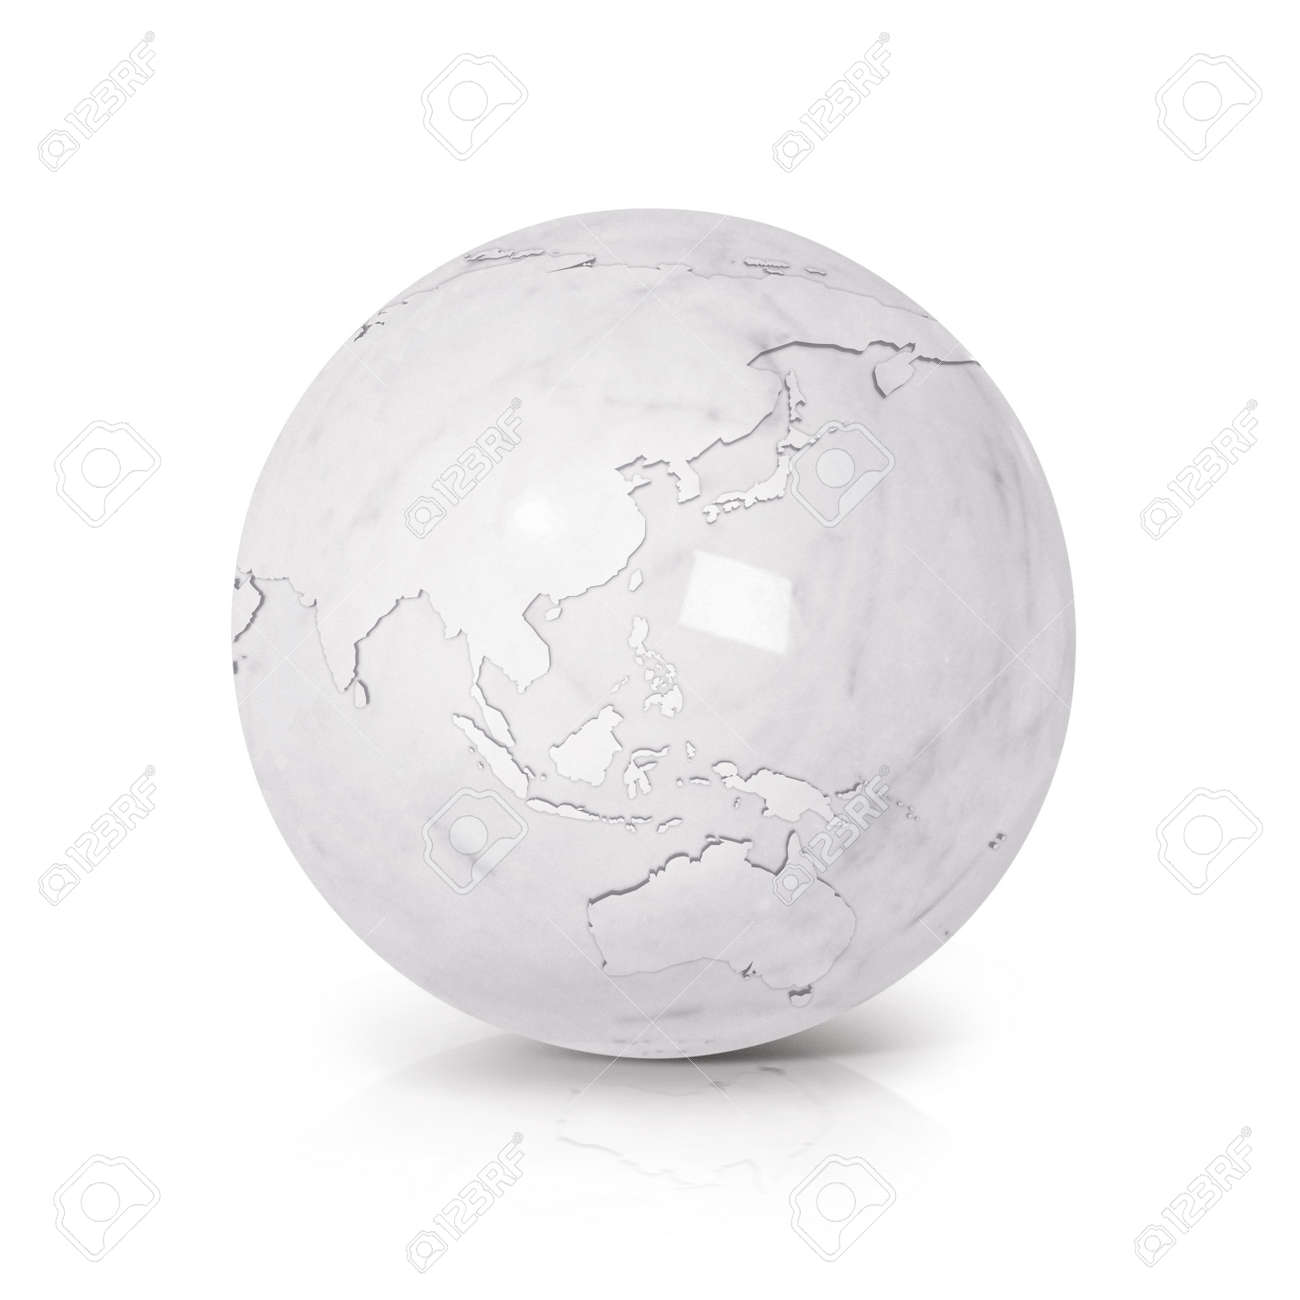 illustration white marble globe 3d illustration asia australia map on white background